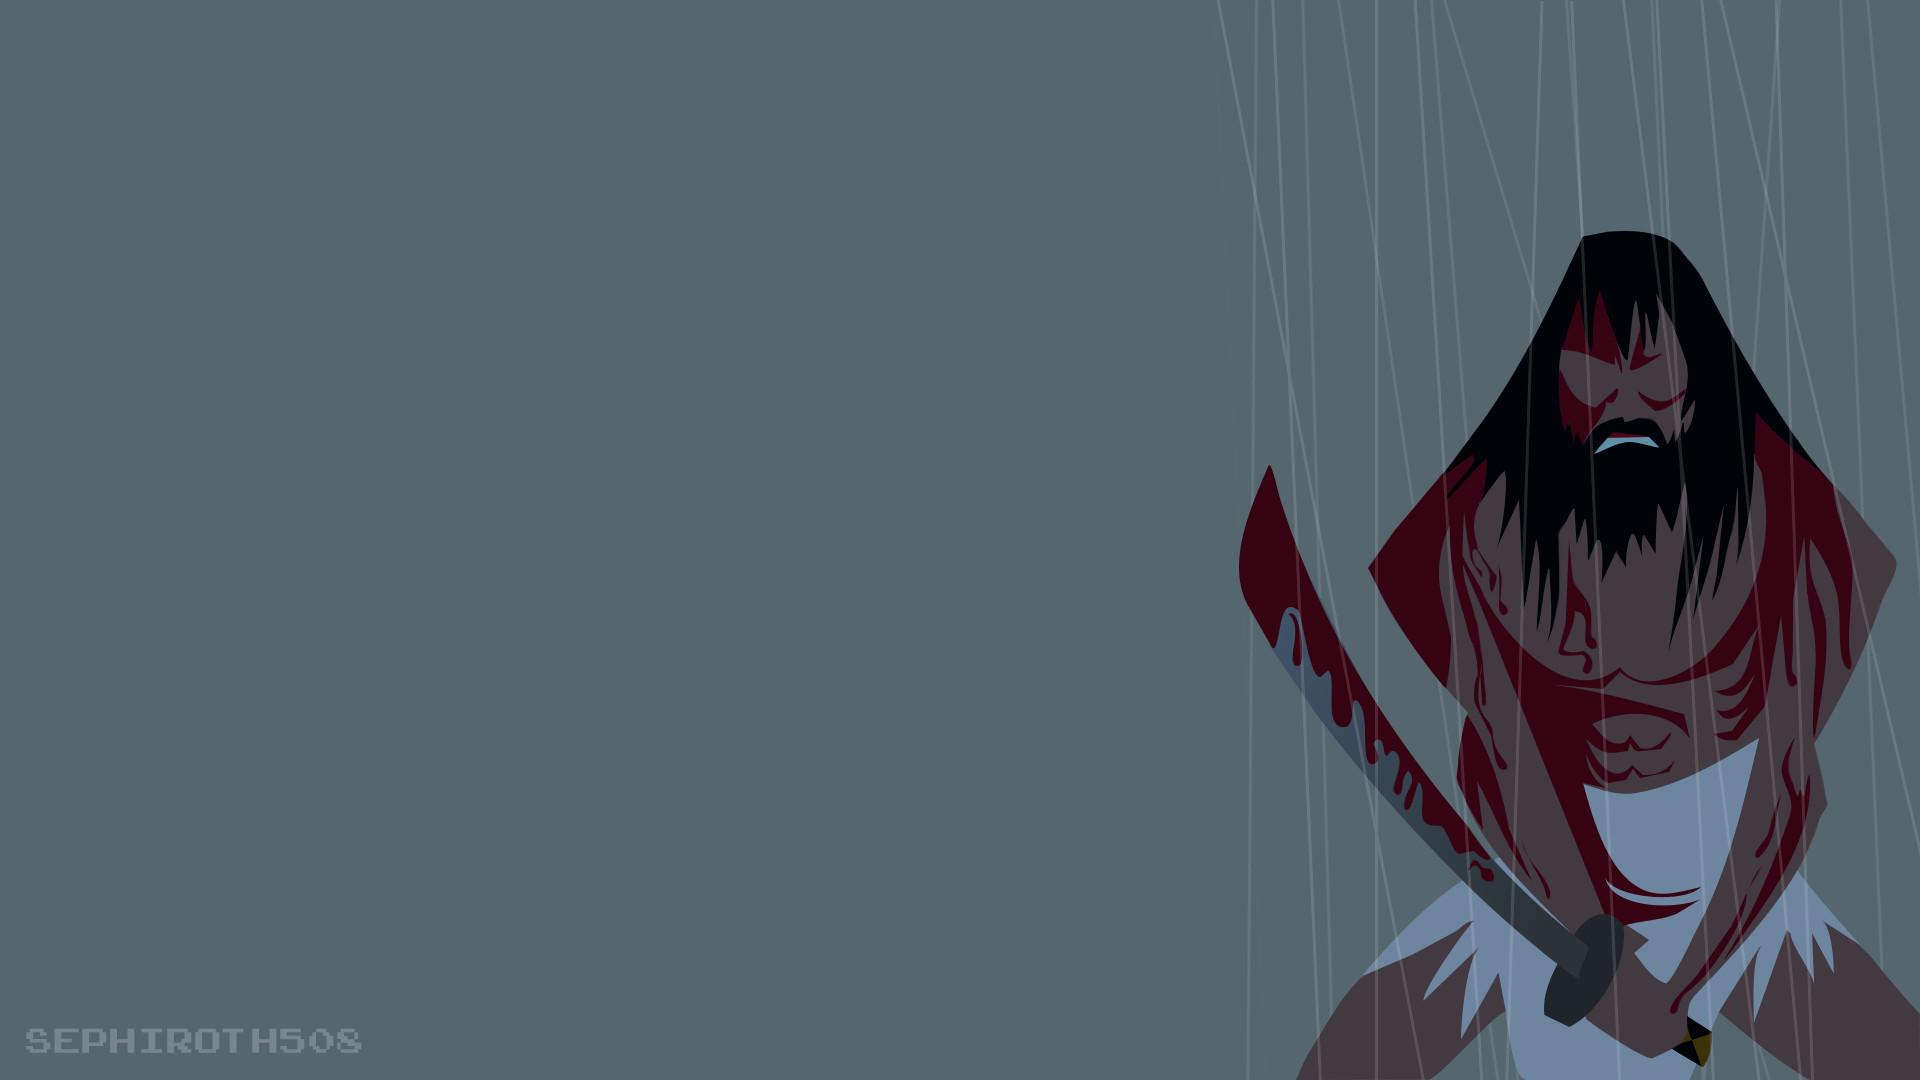 Res: 1920x1080, samurai jack minimalist wallpaper 9